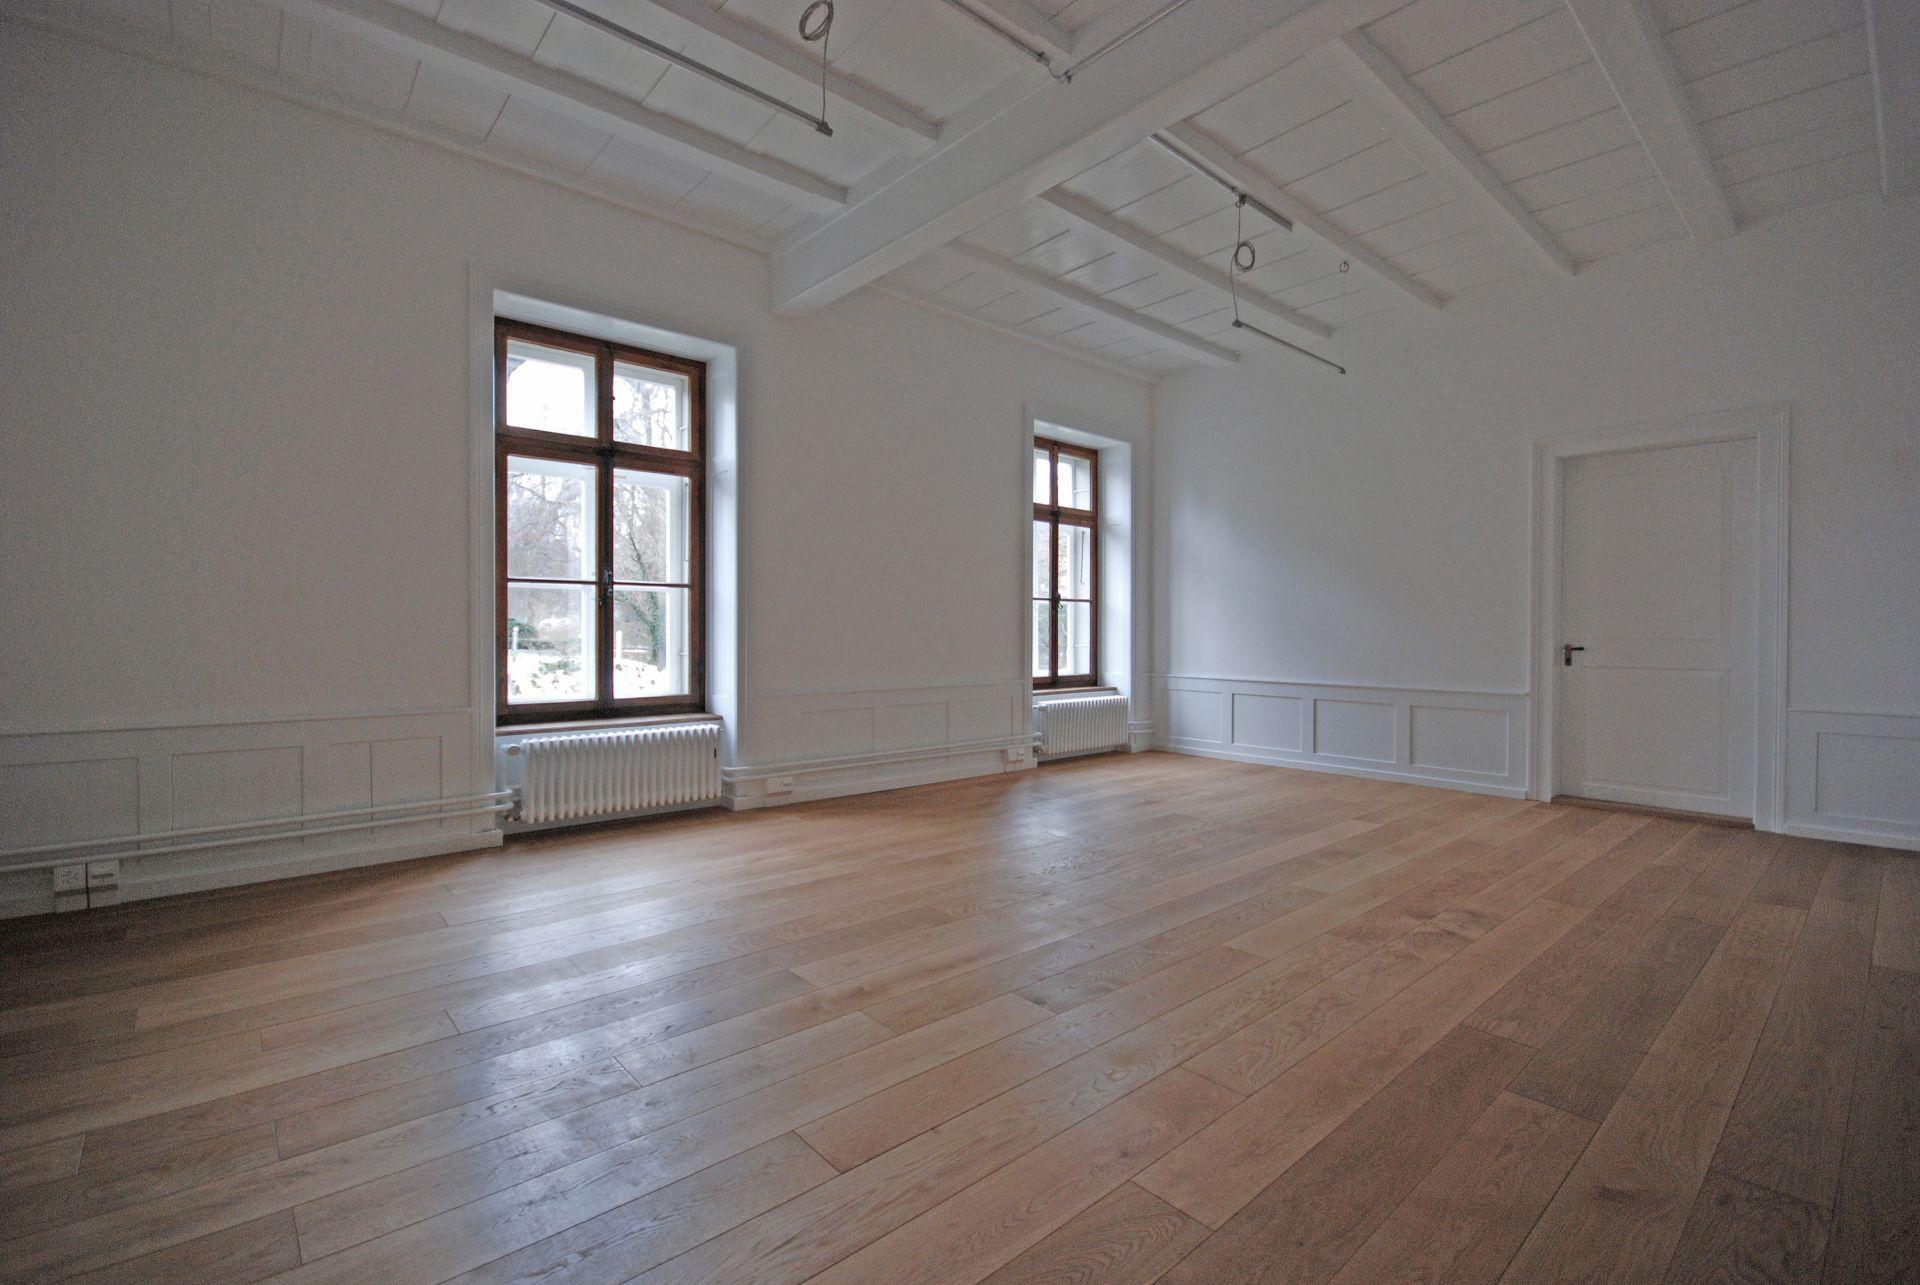 Büro-/Praxis-/Therapieräume an bester Lage